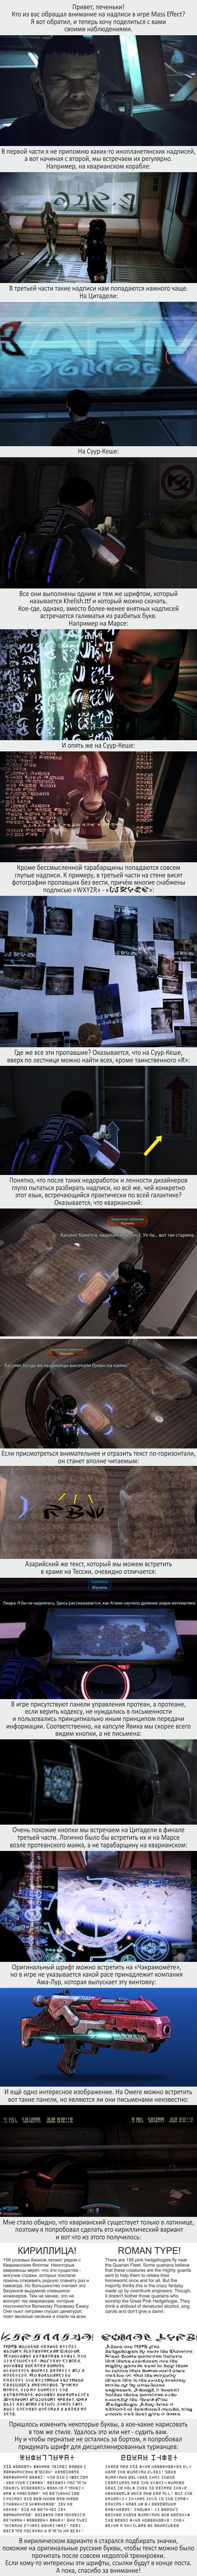 Mass Effect - шрифты инопланетян Mass effect, Шрифт, Кварианцы, Азари, Турианцы, Длиннопост